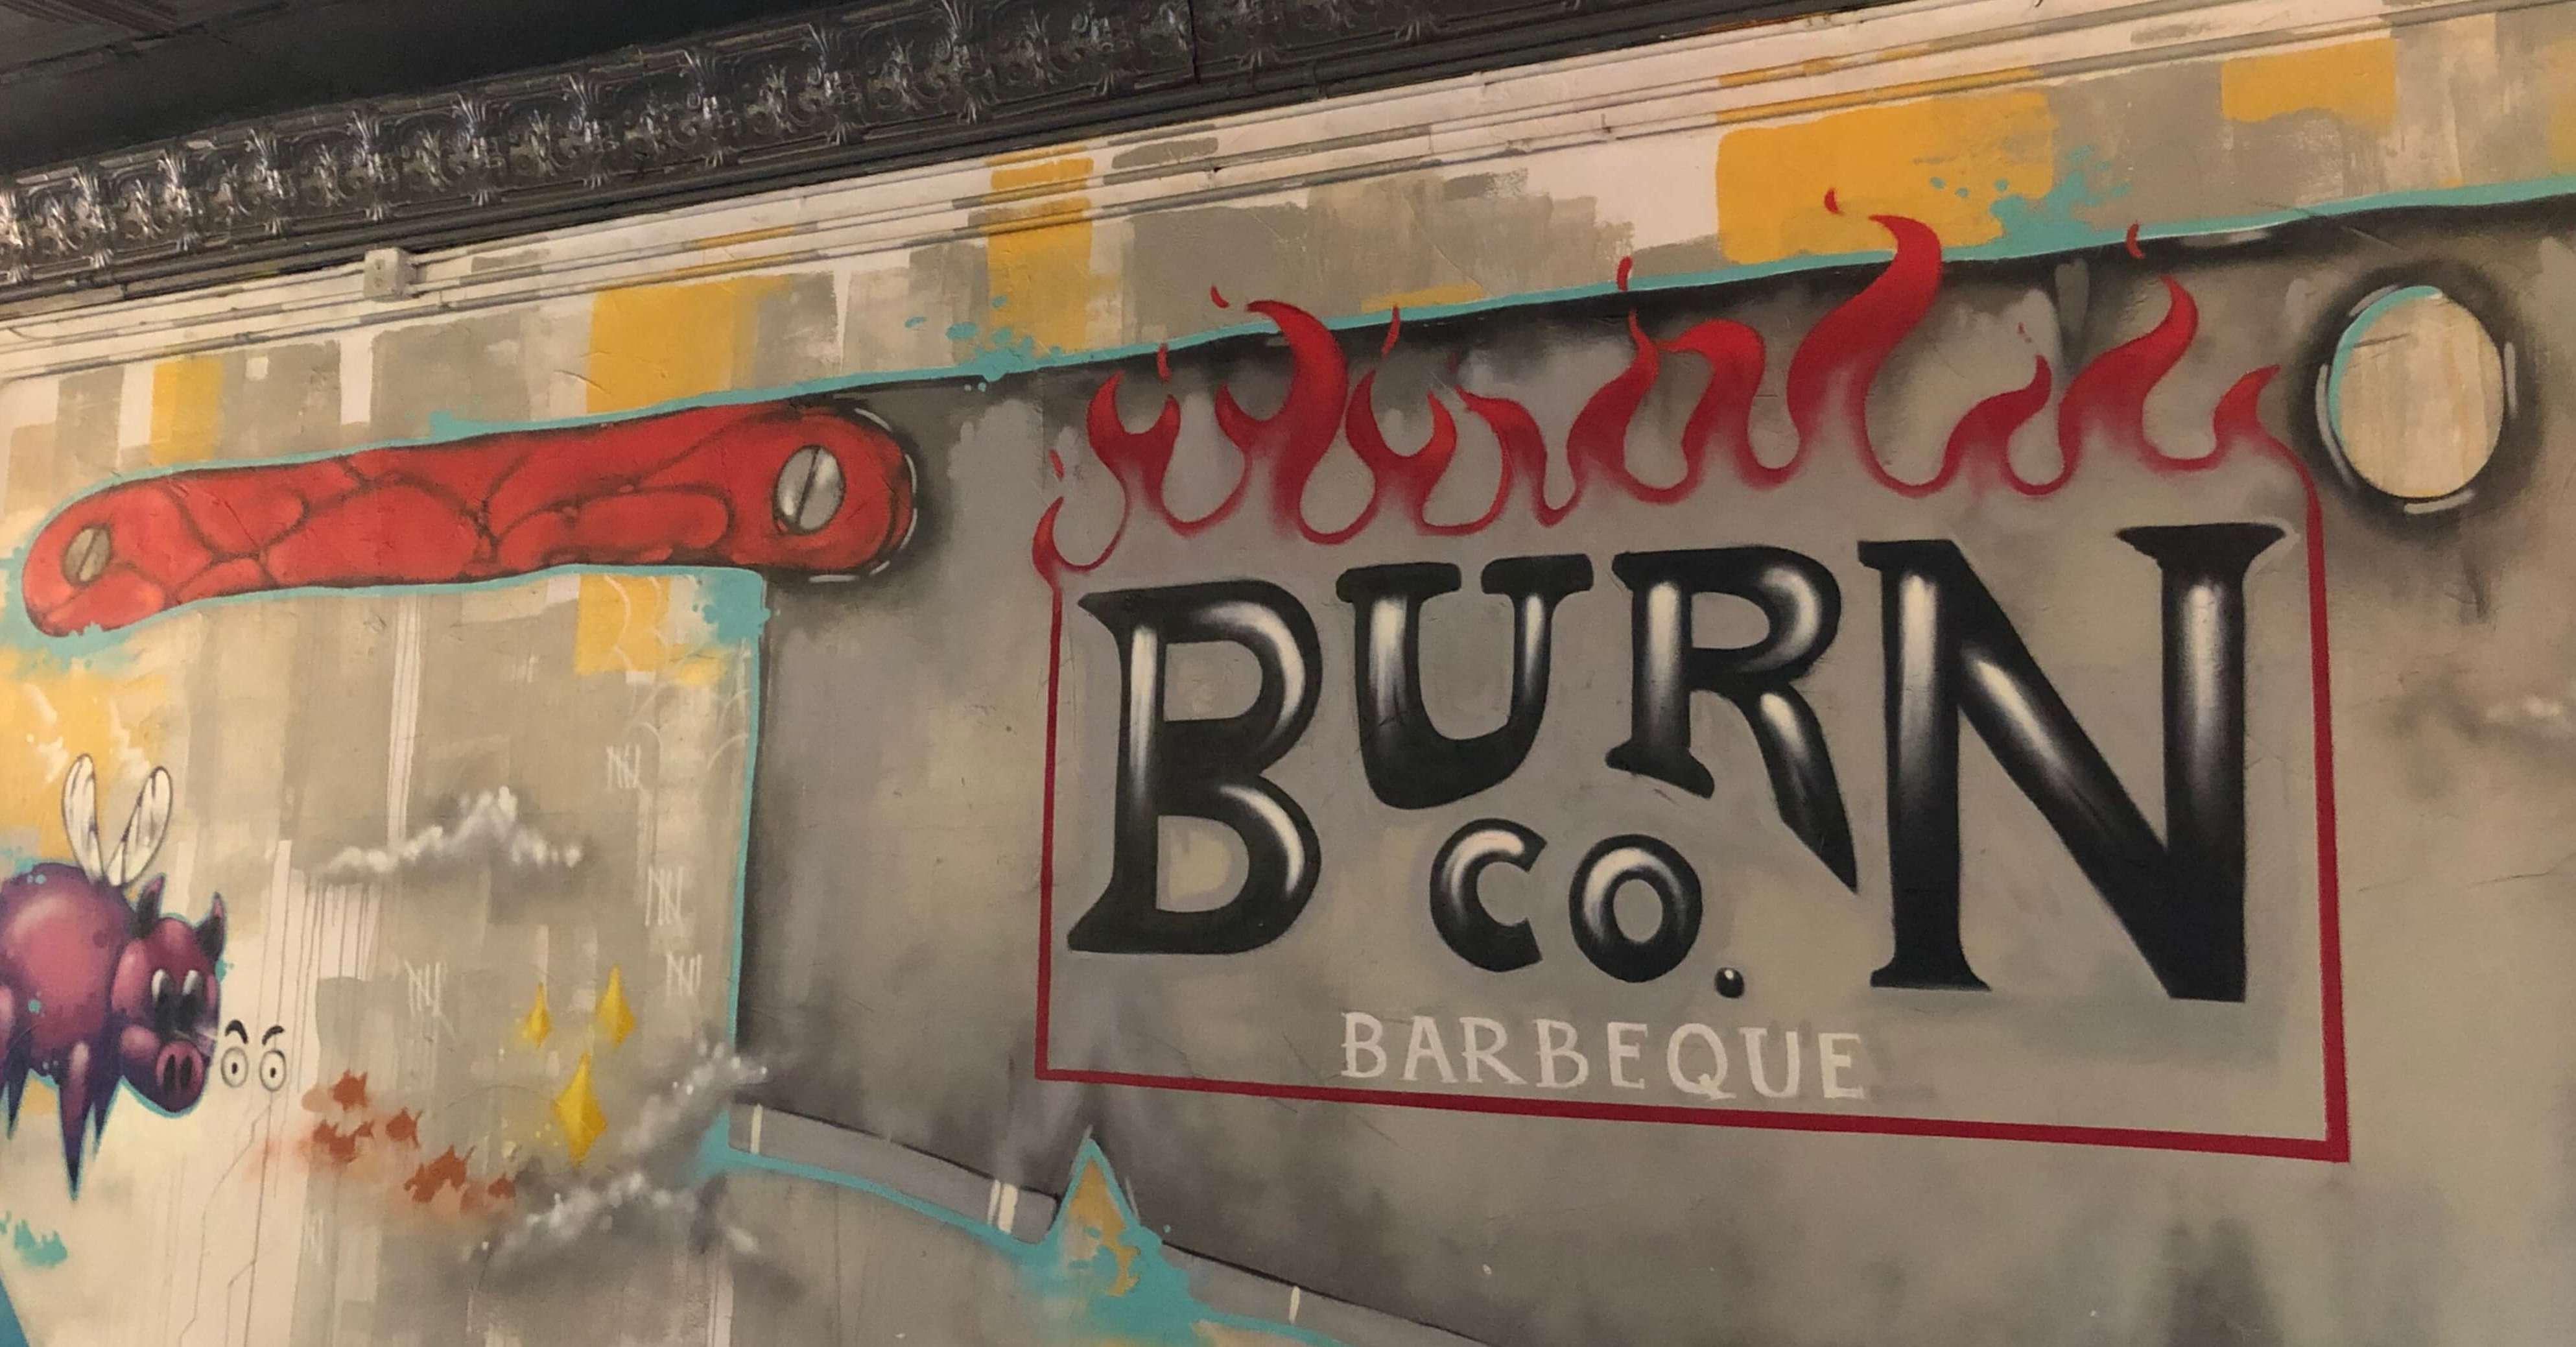 BurnCo BBQ meats in Tulsa